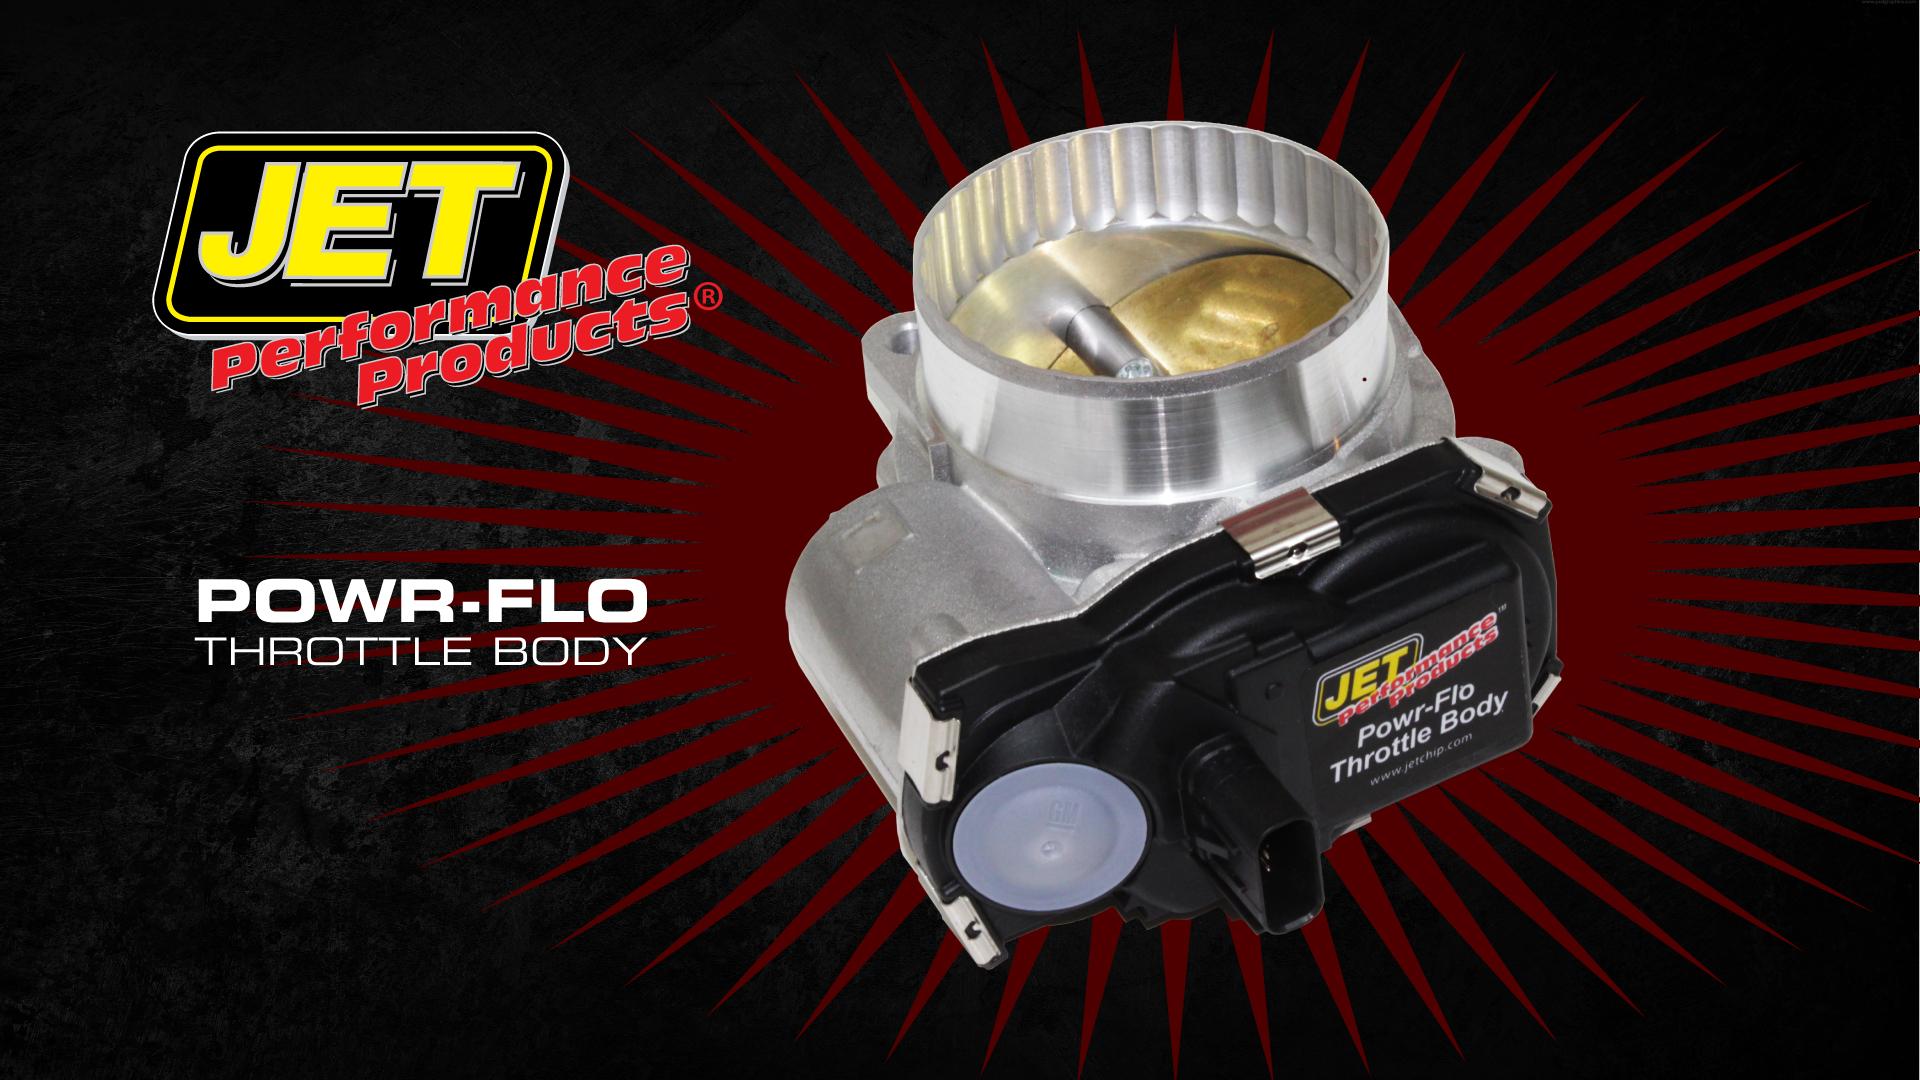 Jet Performance Products – JET Performance Automotive Parts